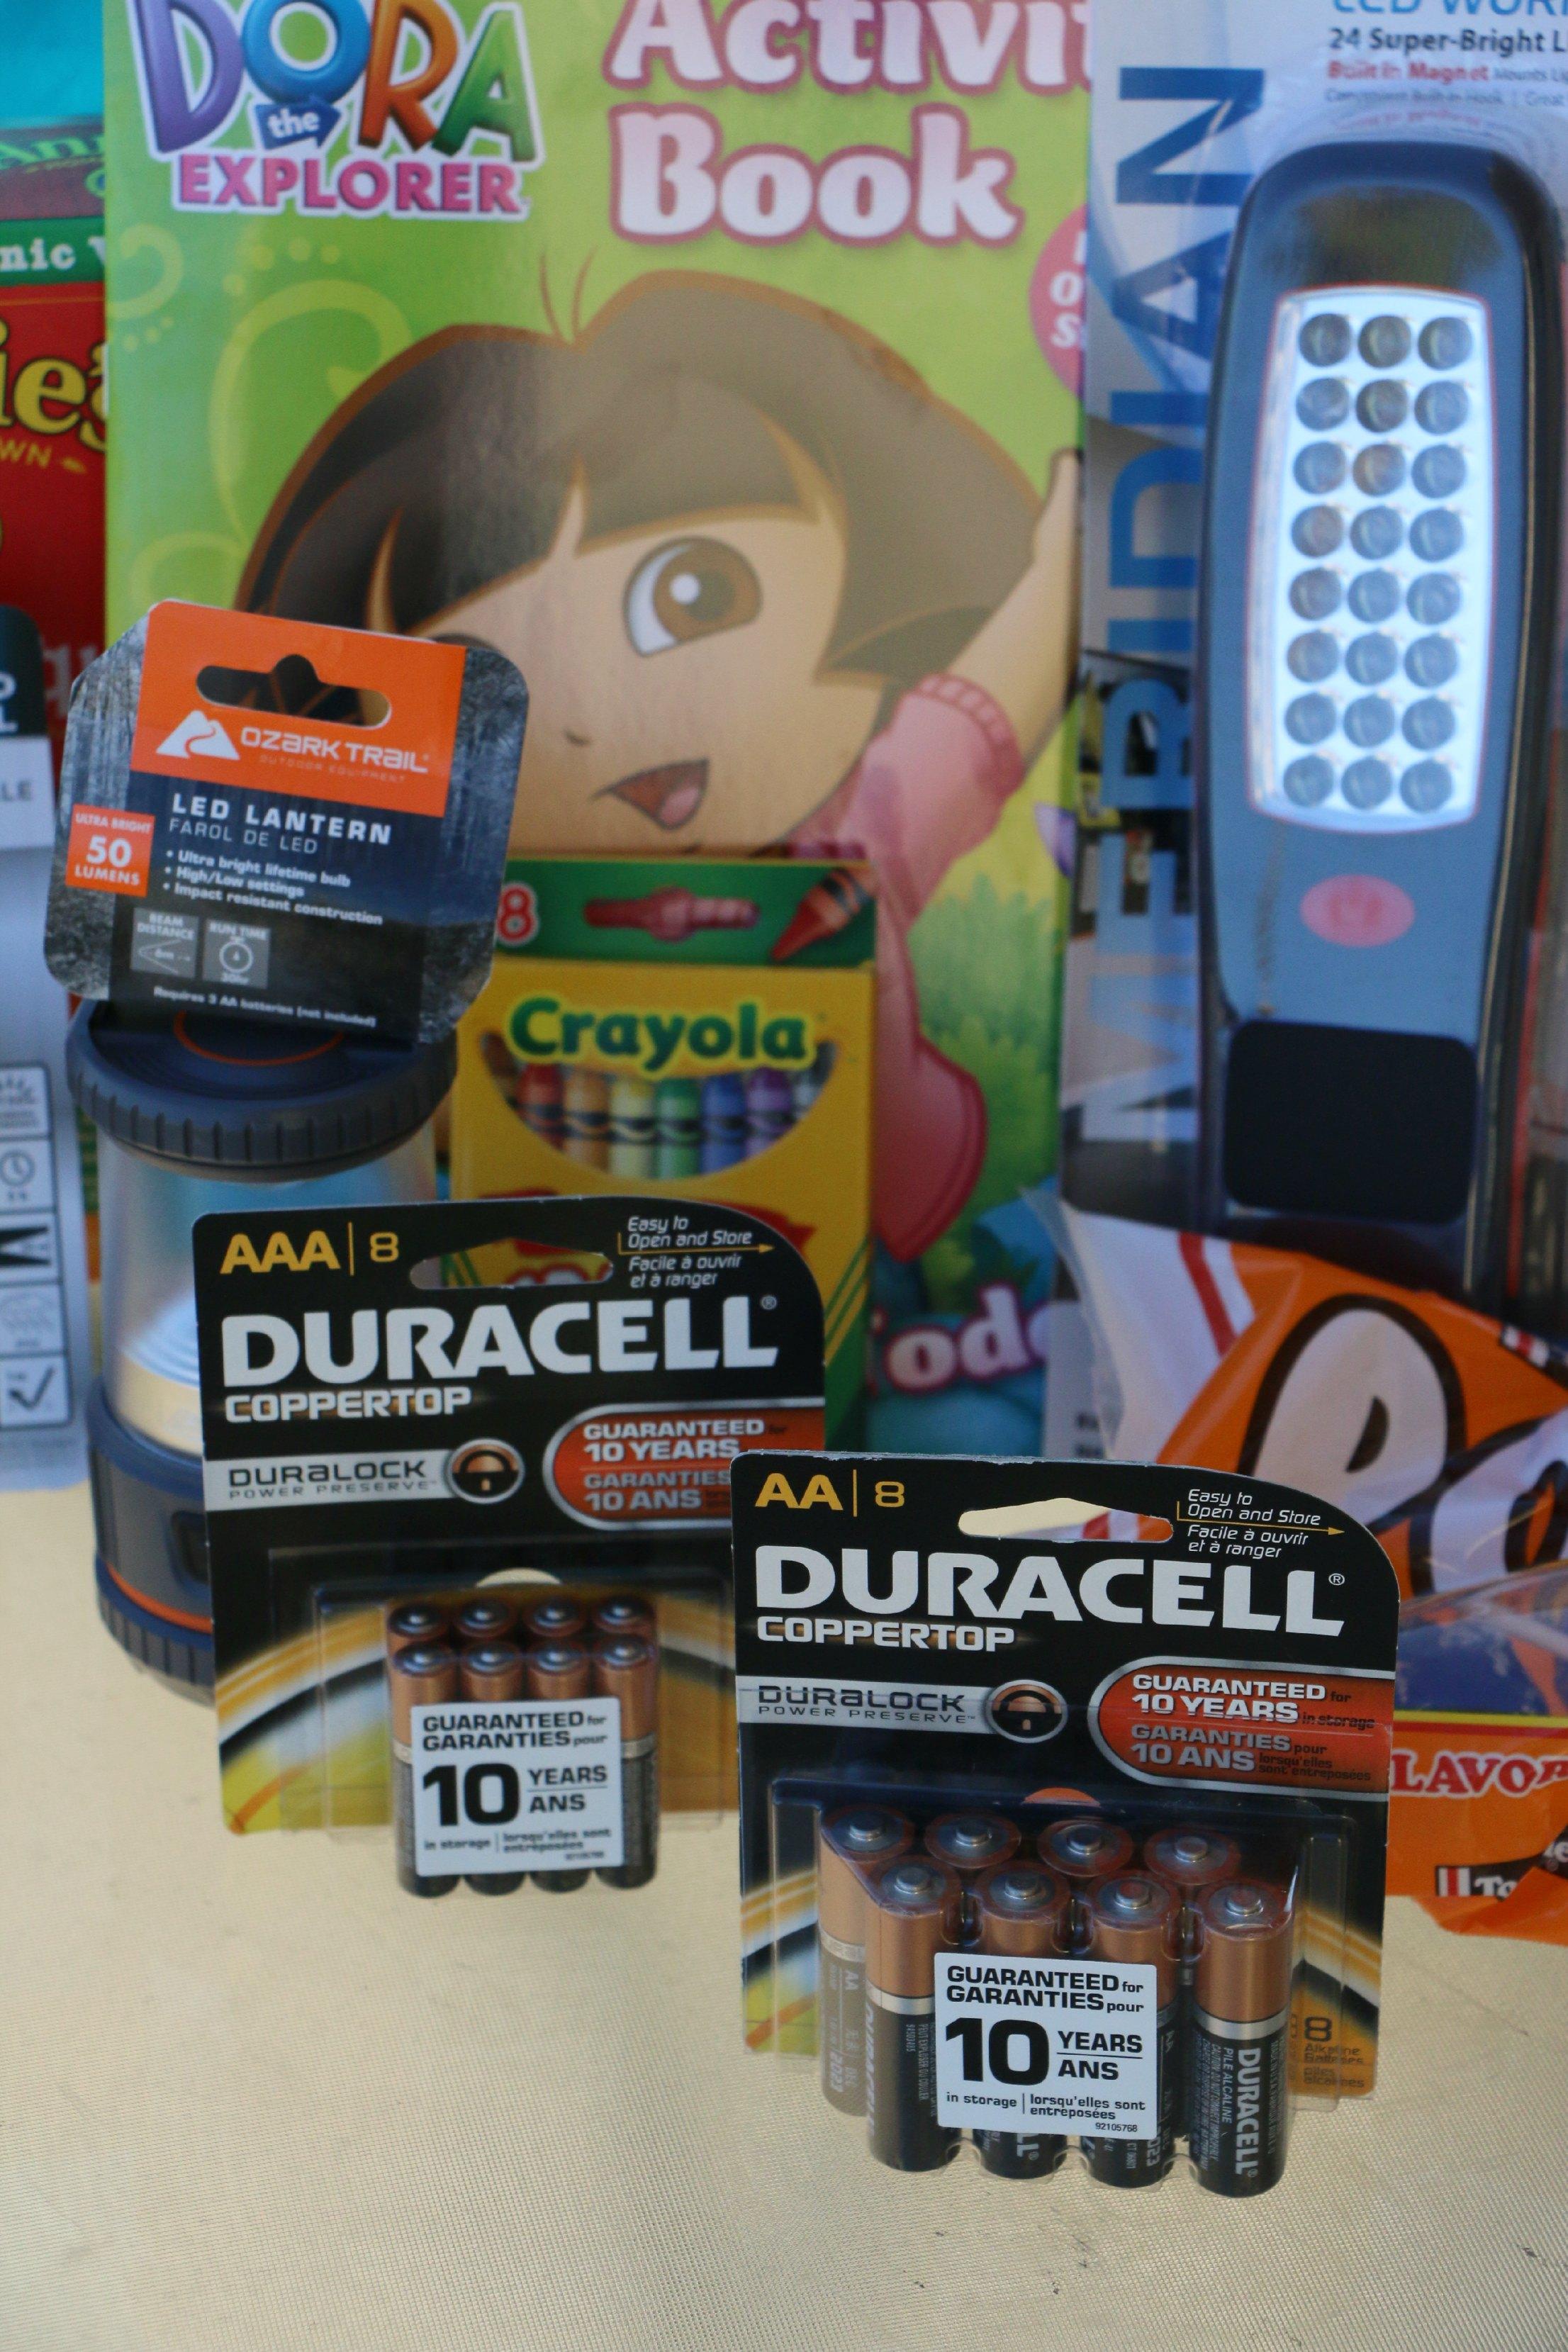 duracell emergency kit